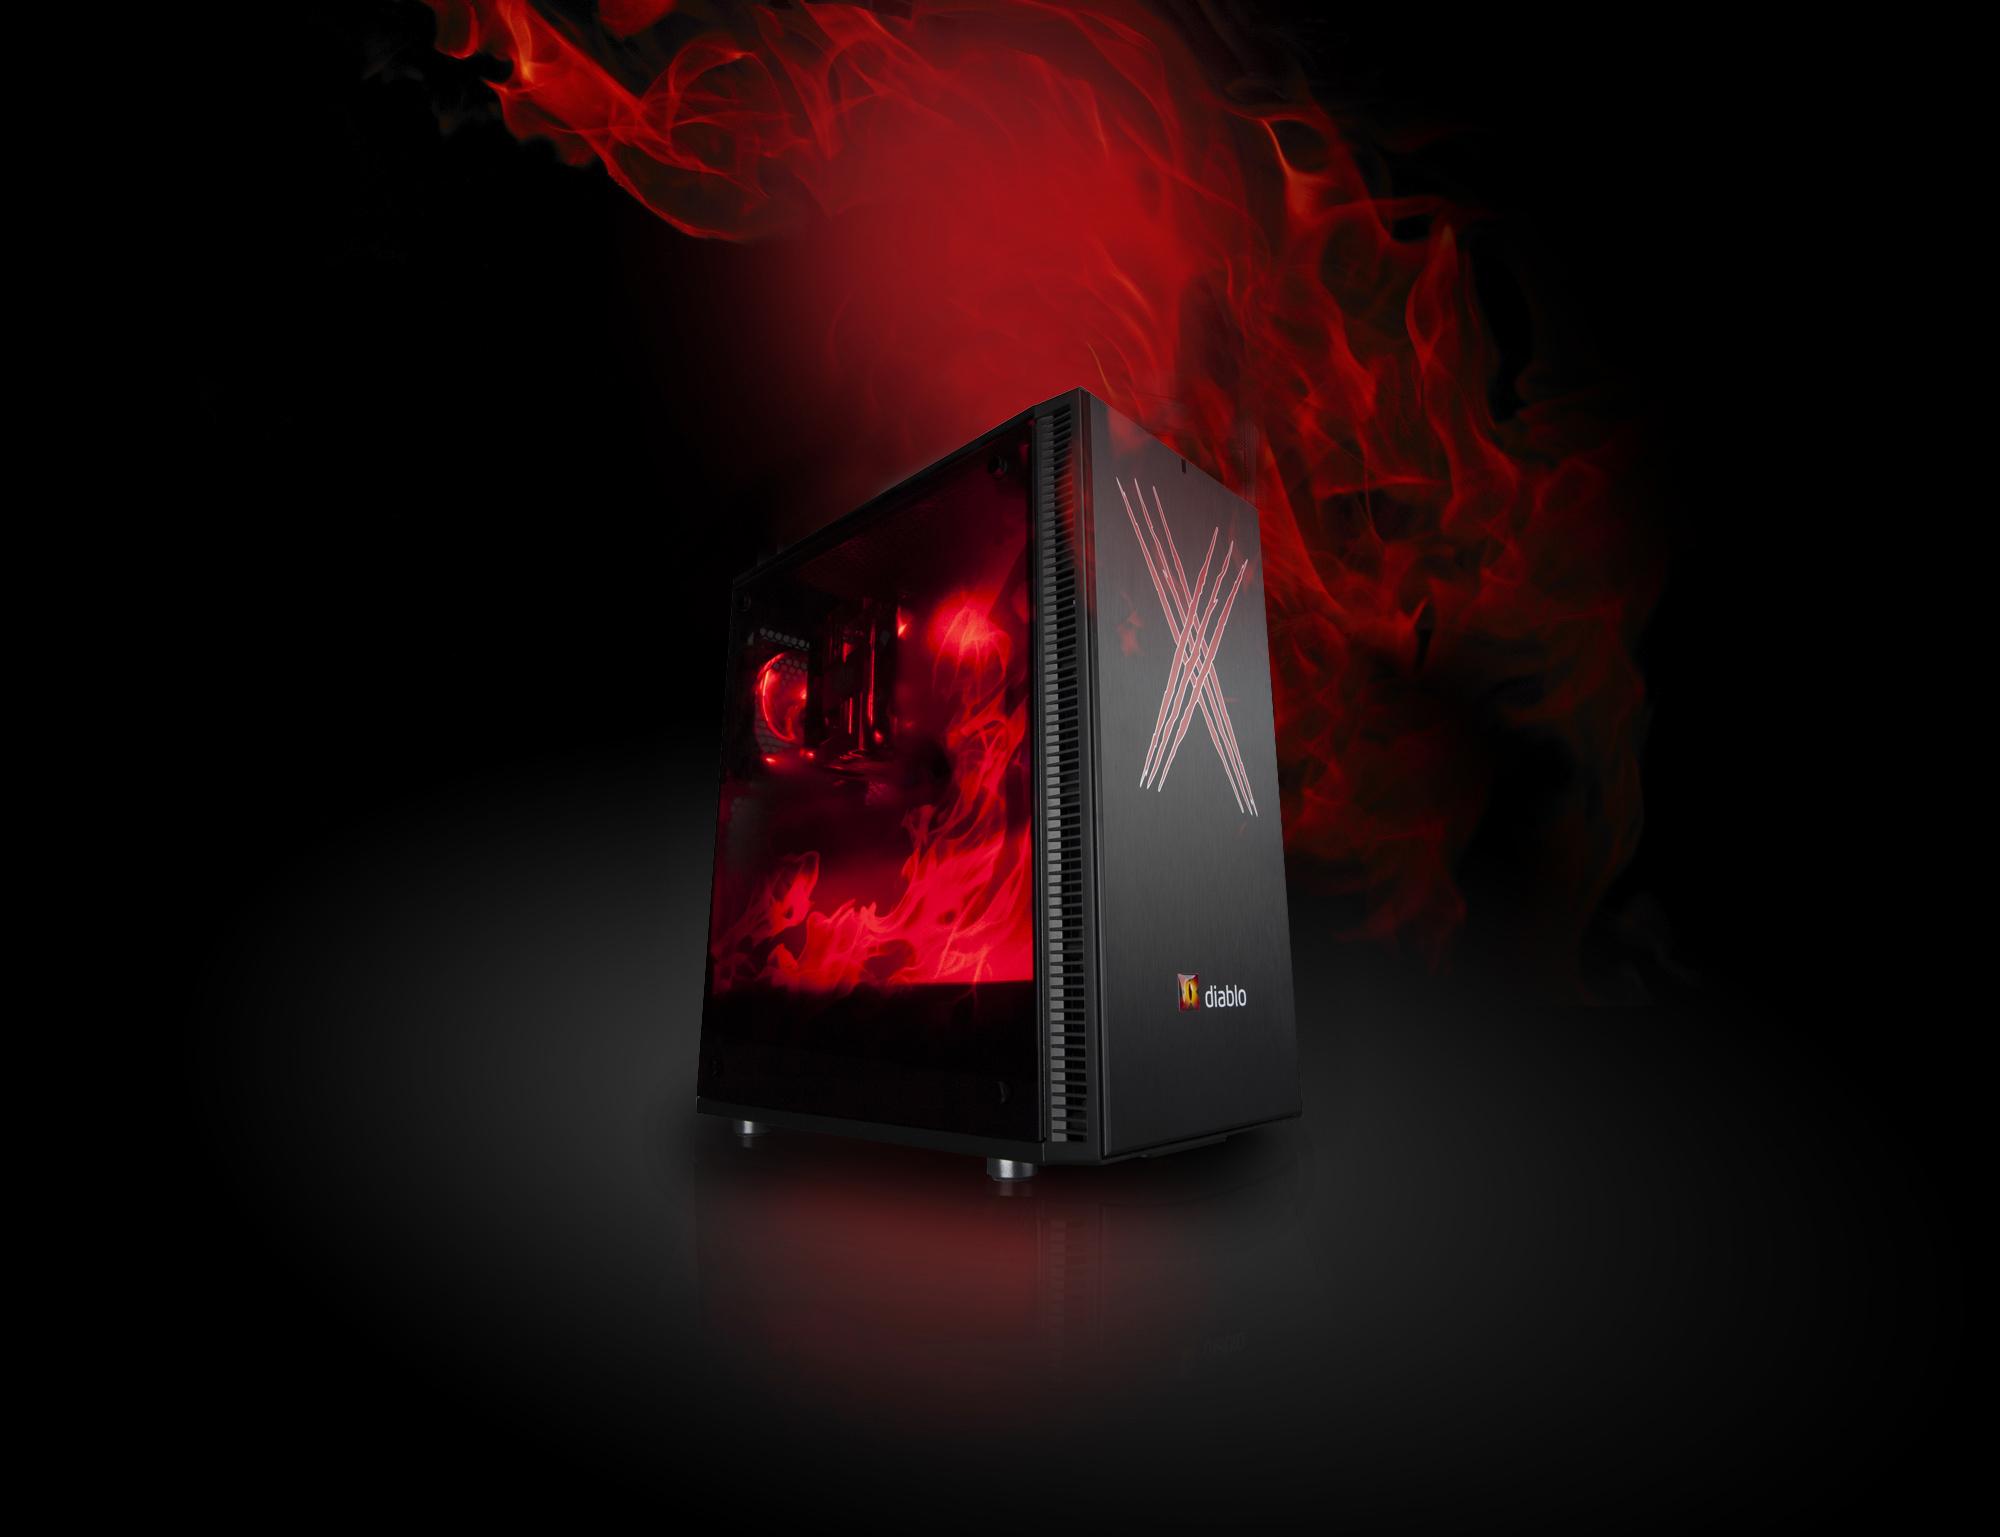 X-DIABLO Gamer X710 3070 (i7-10700F/16GB/SSD 1000GB NVME/RTX3070/W10/Wifi/LED) - 11554312